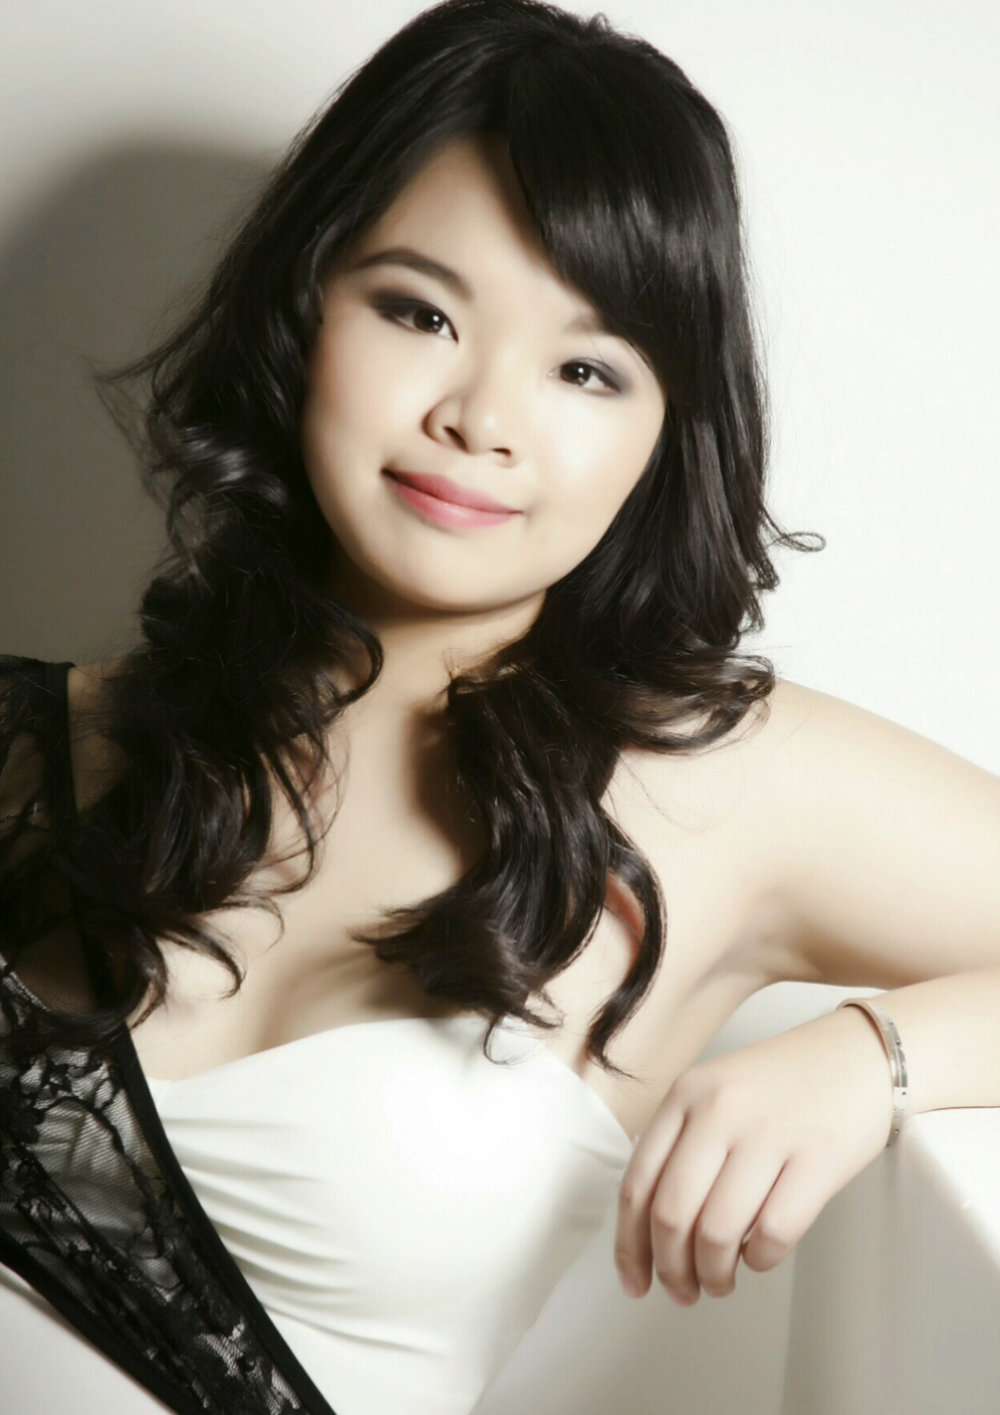 Trinh Lu Photoshoot.jpg